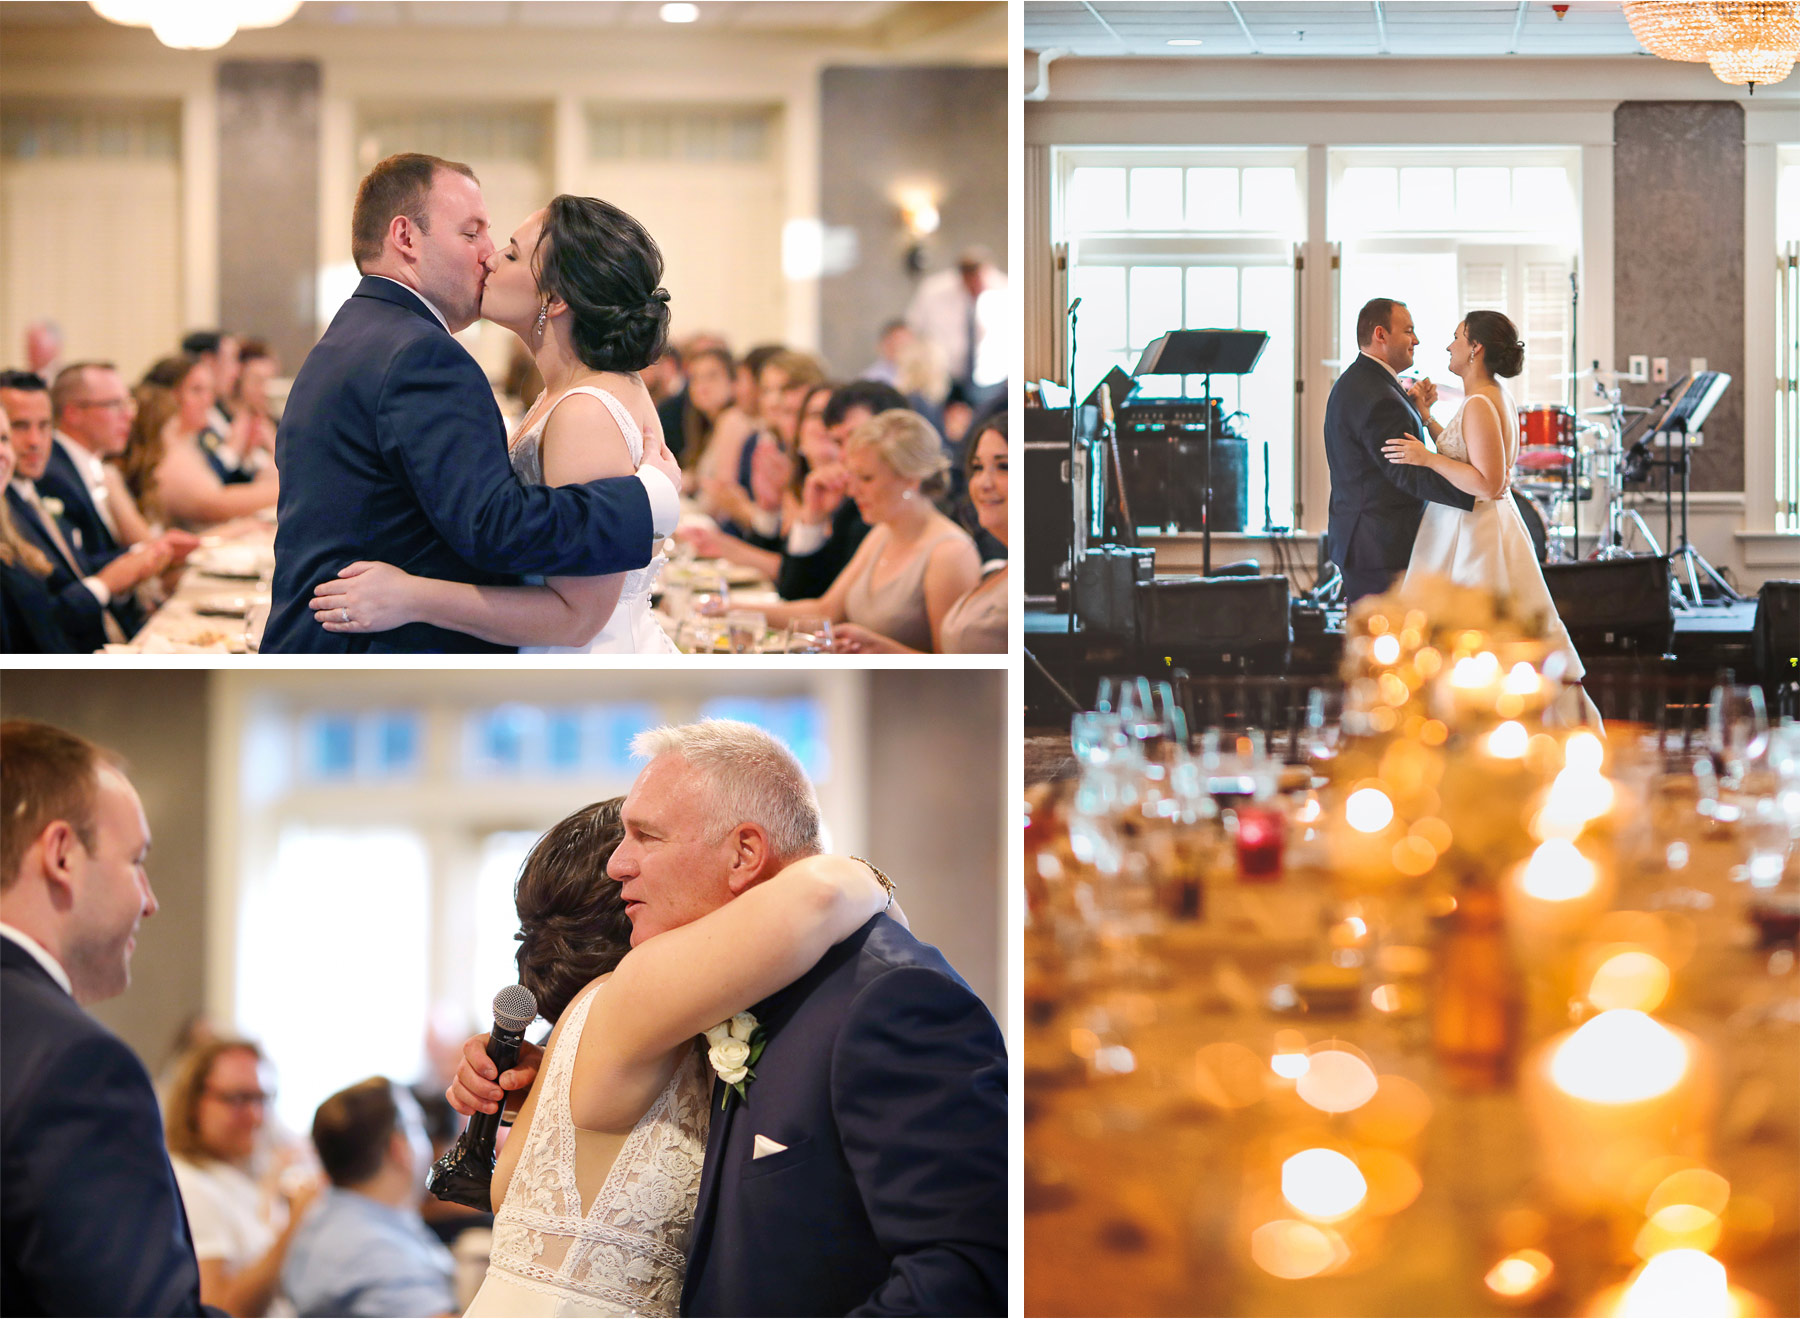 19-Vick-Photography-Wedding-Minneapolis-Minnesota-Edina-Country-Club-Reception-Dance-Kiss-Erin-and-David.jpg